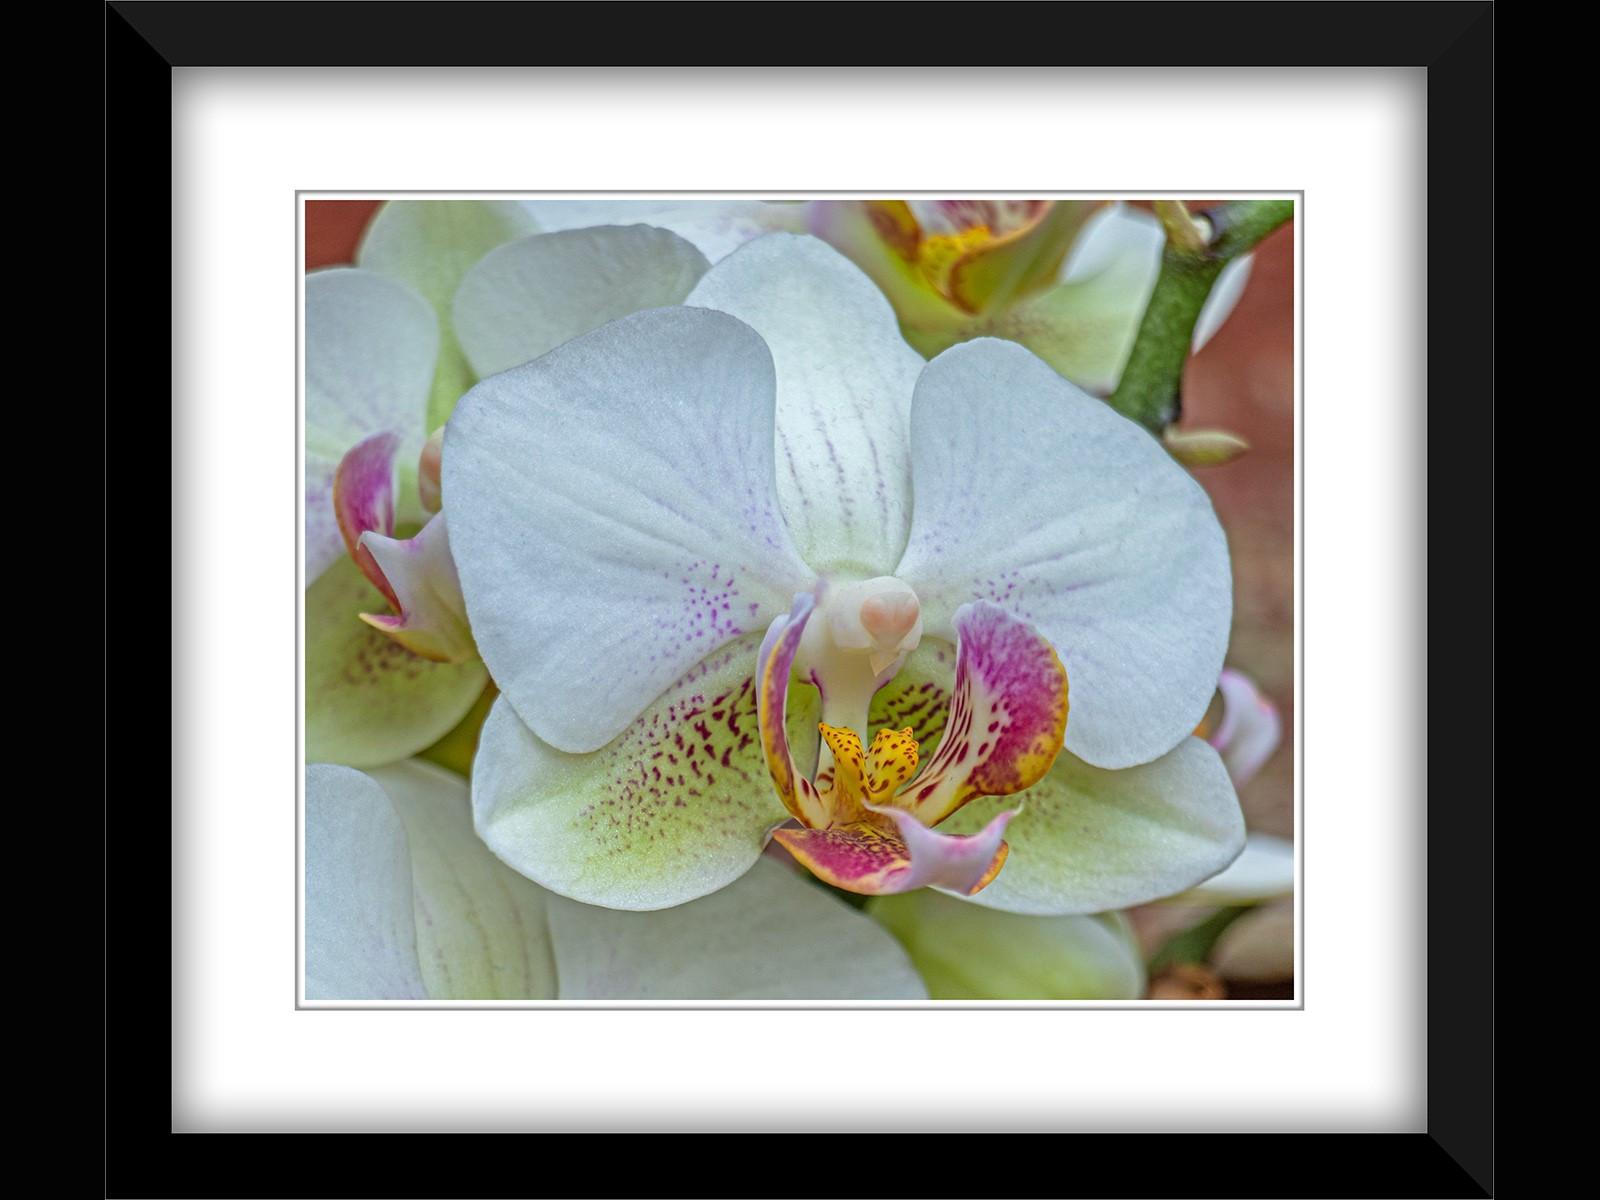 14. Phalaenopsis (moth orchid)